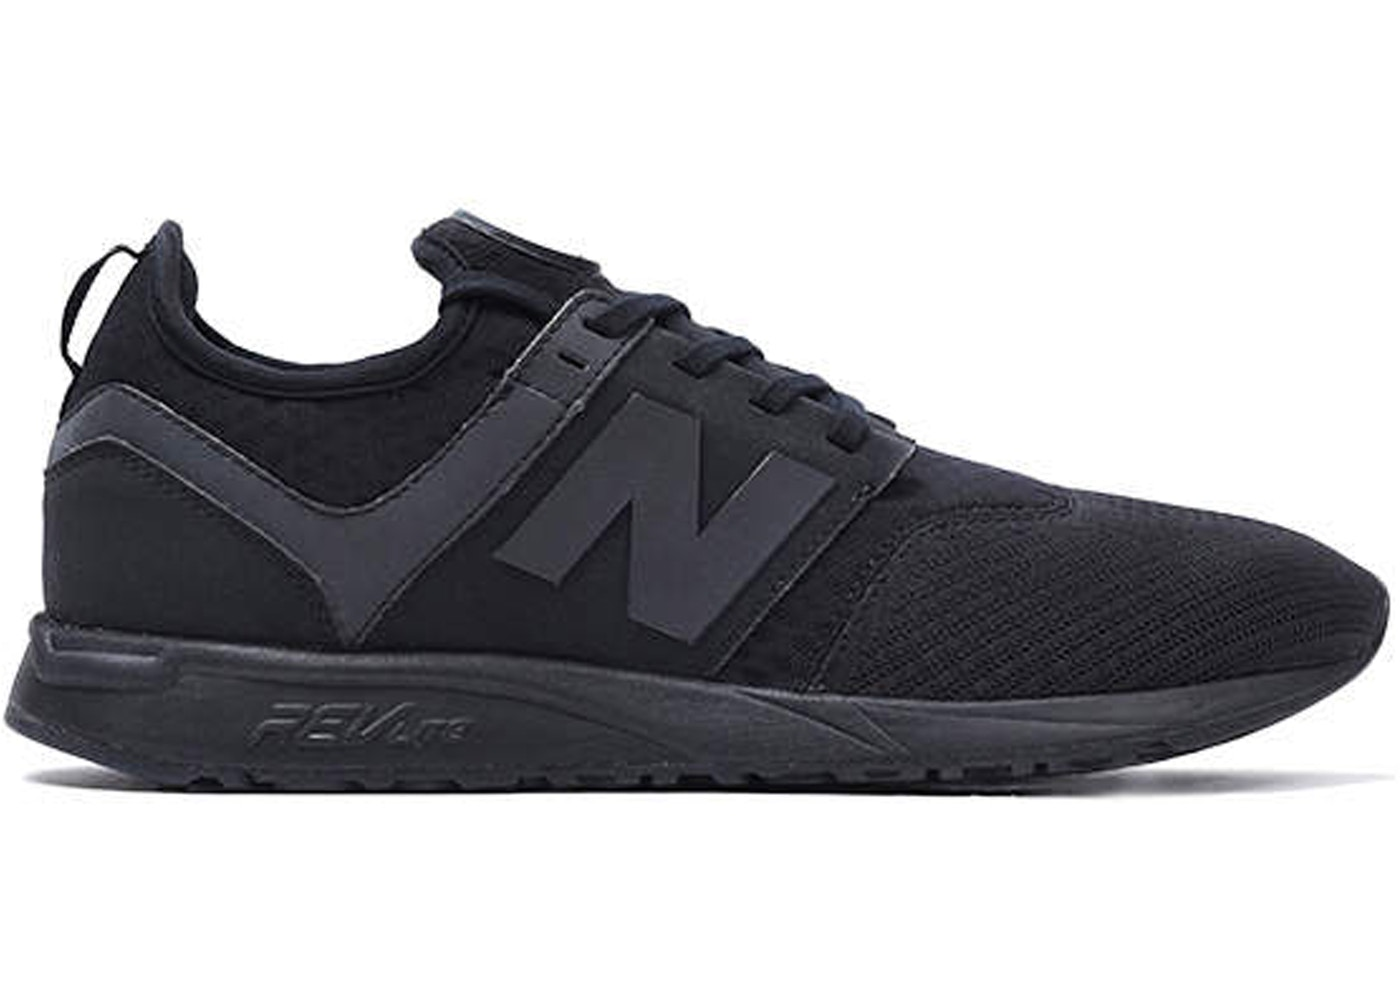 New Balance 247 Sport Black - MRL247BK